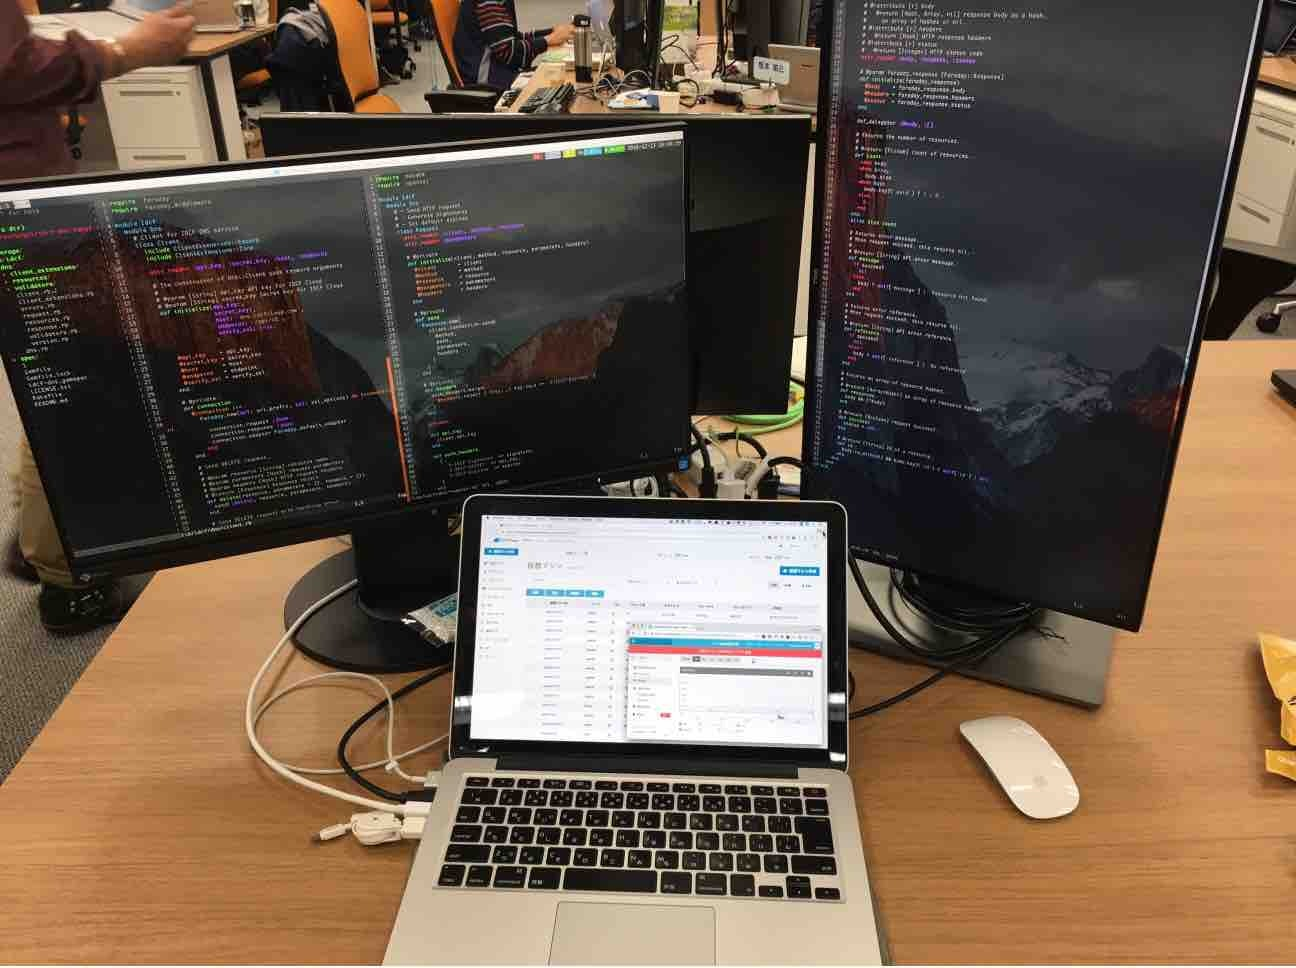 PC_display.jpg